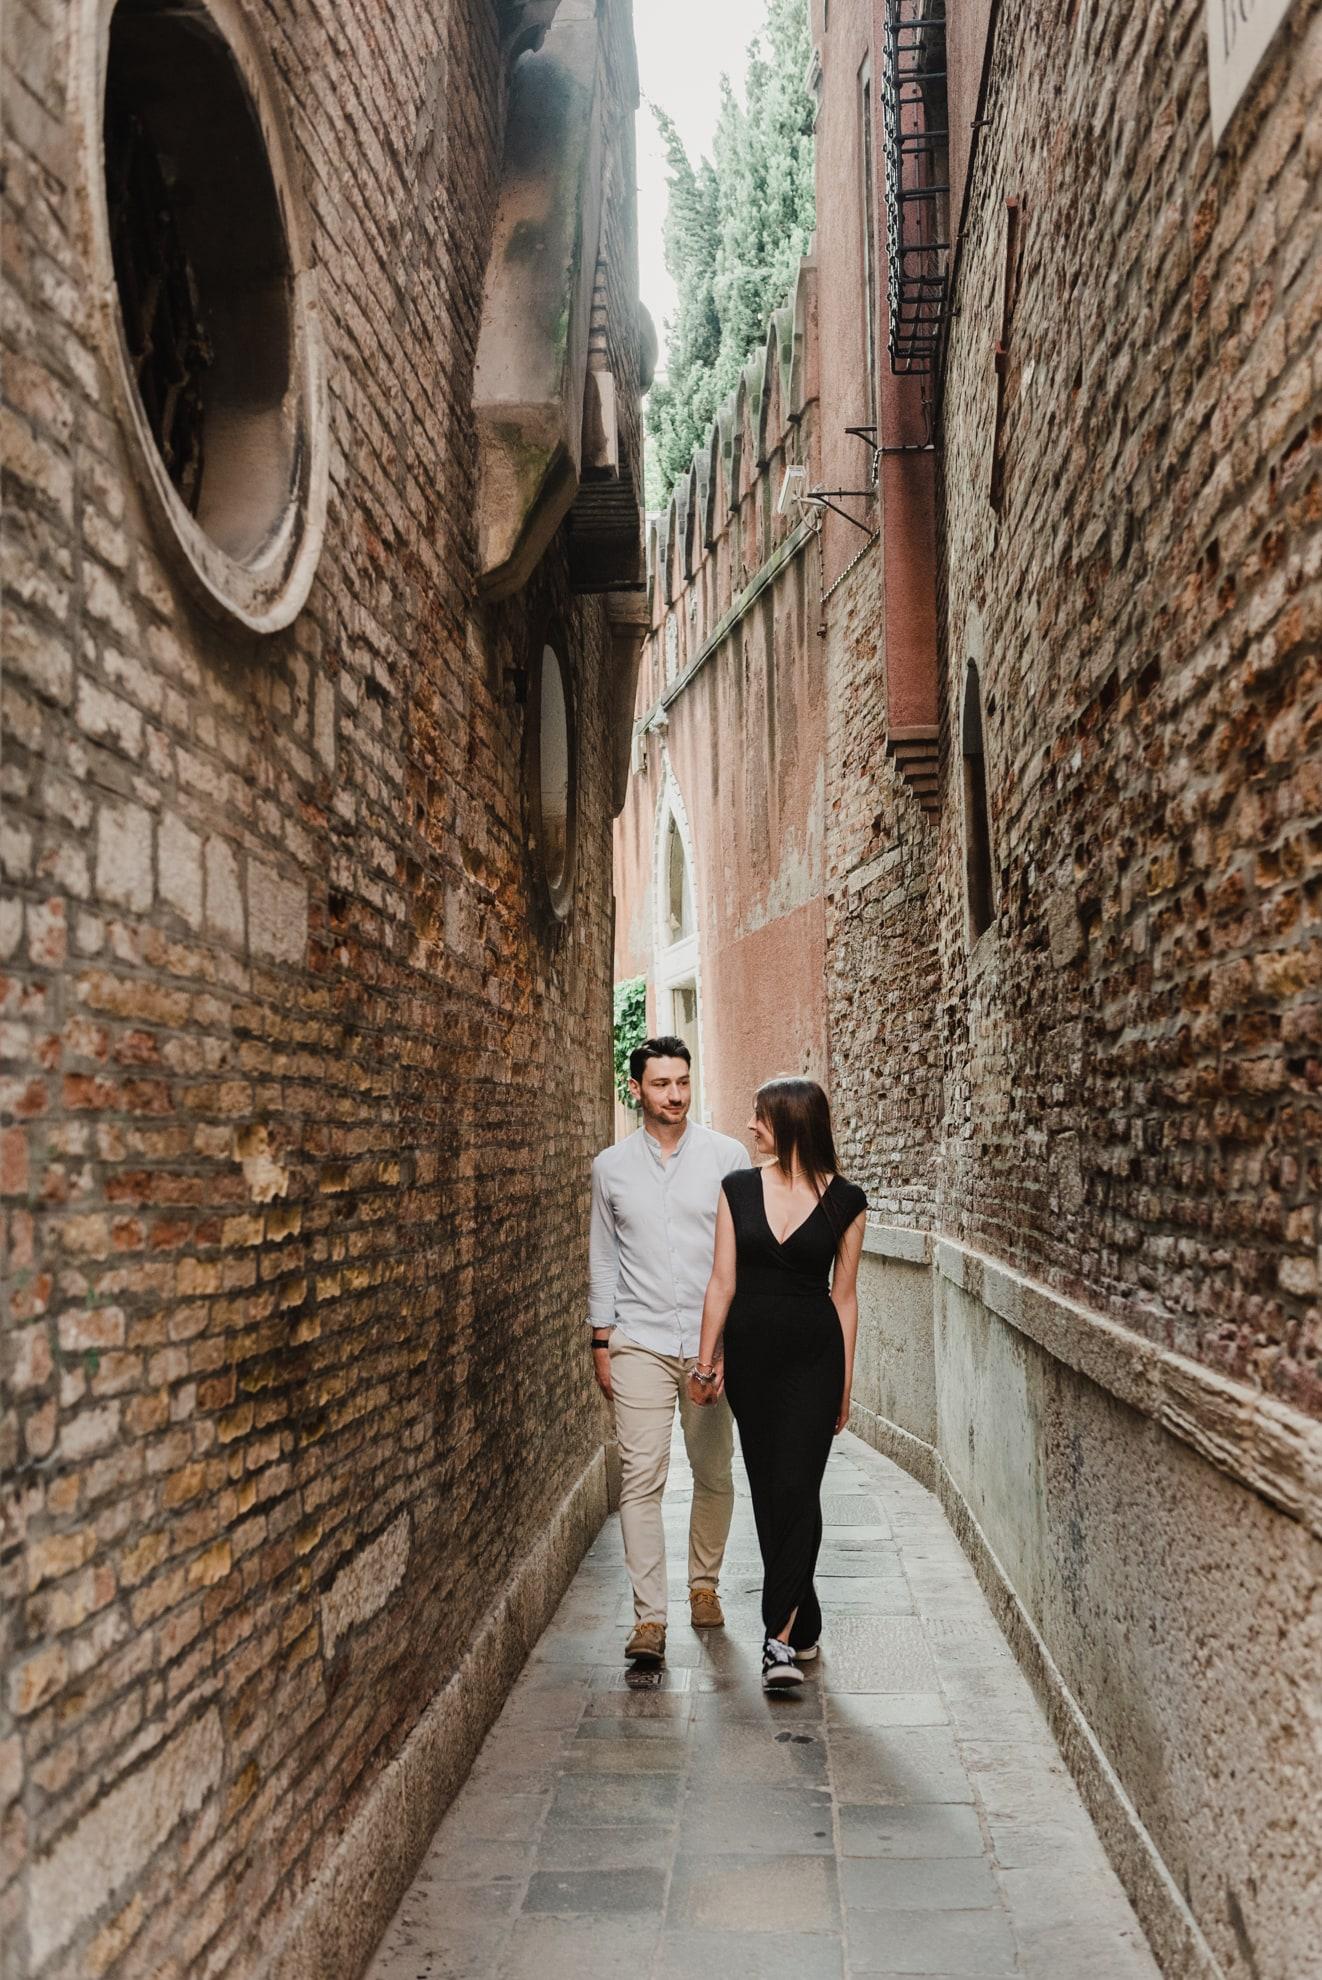 engagement venice venezia proposal proposta matrimonio fidanzamento irene pollacchi fotografa 11